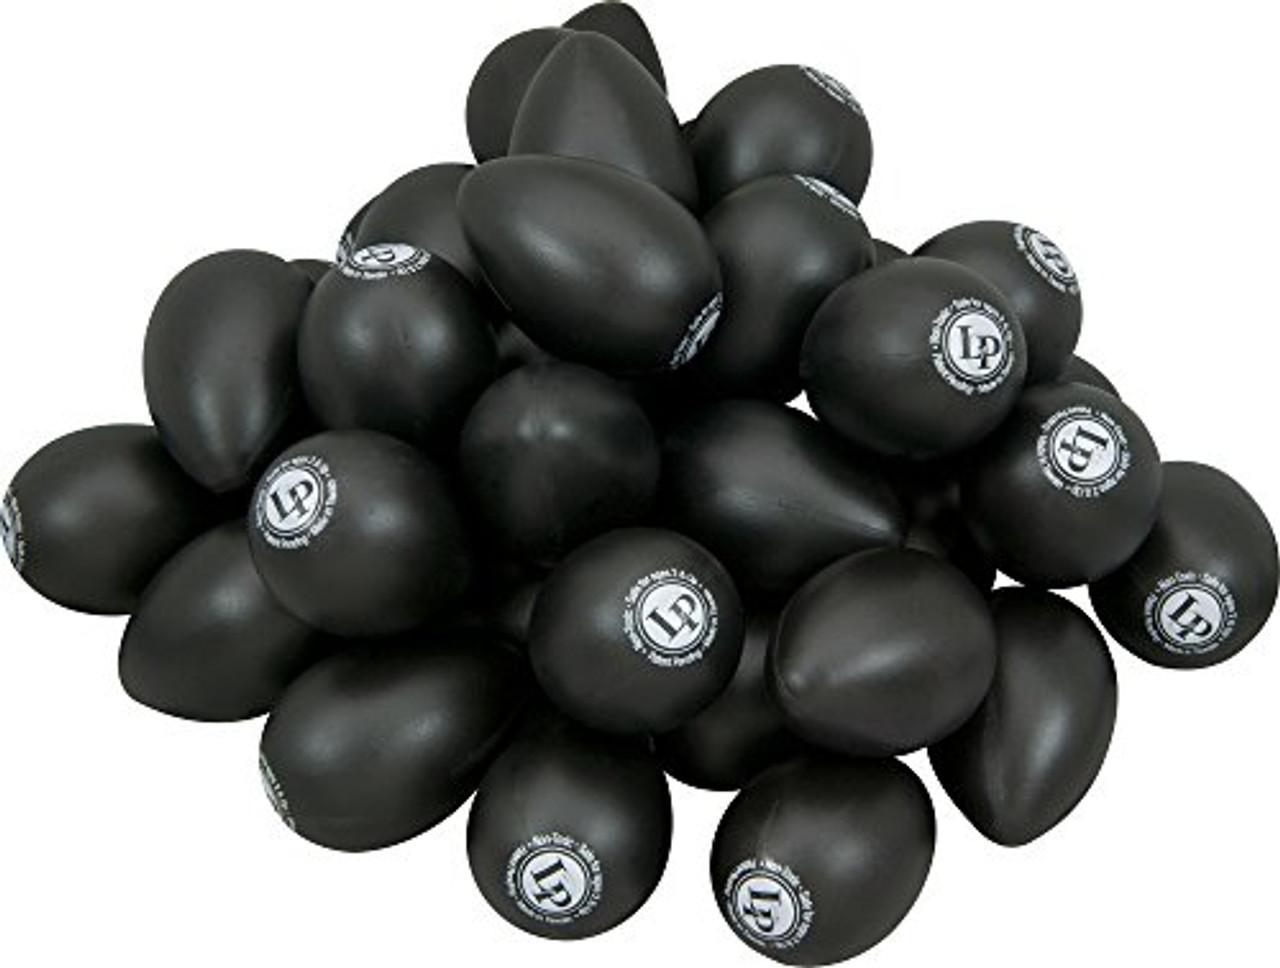 Drum Workshop Egg Shakers - 36 Black